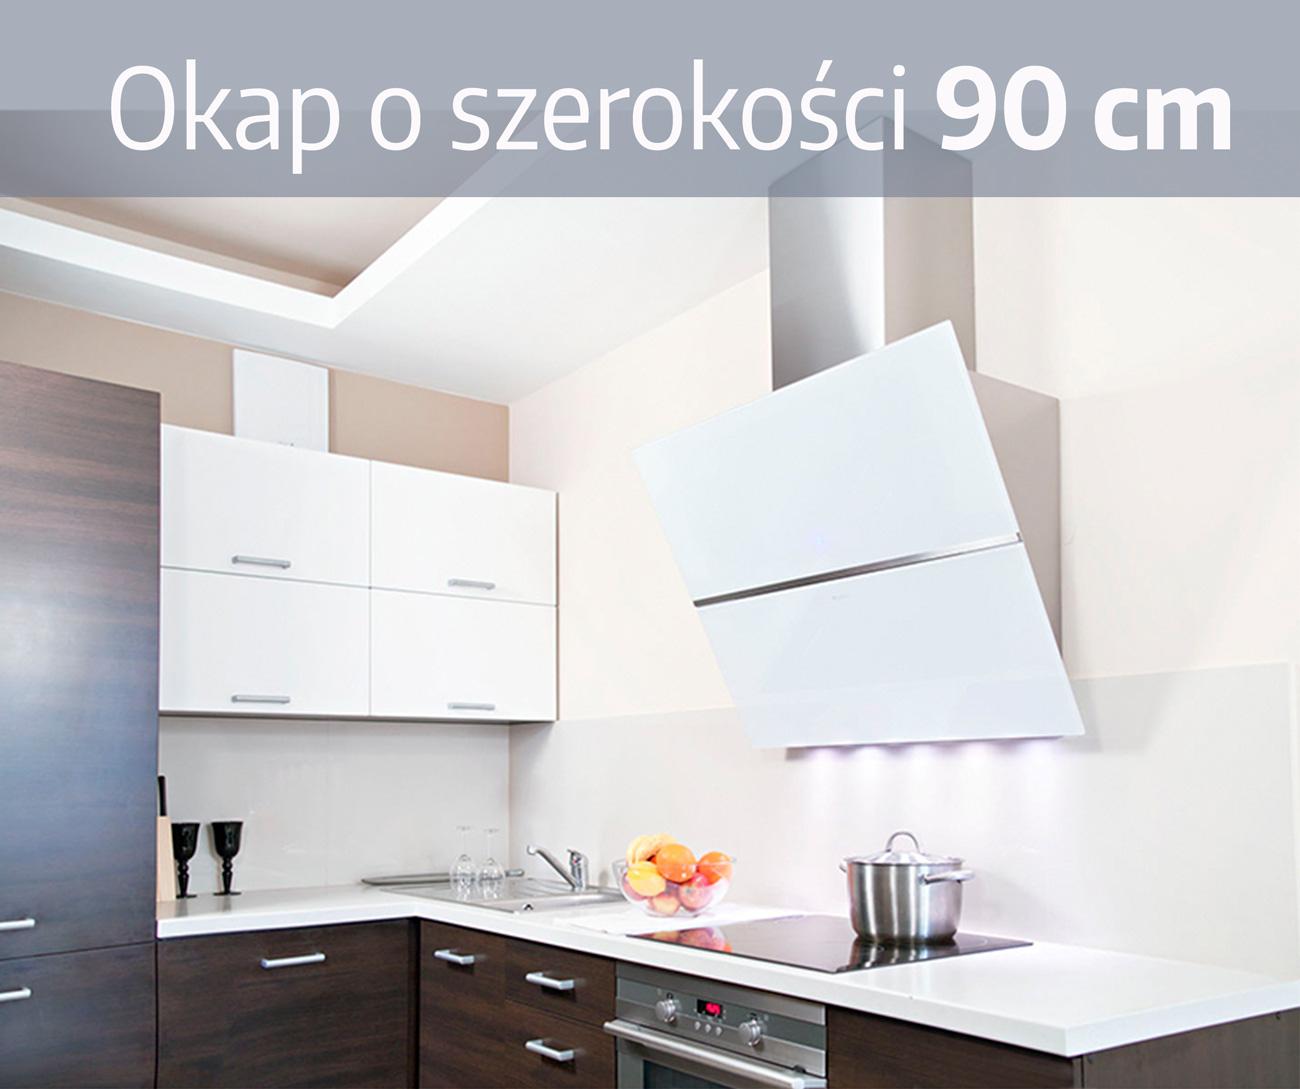 Okap 90 cm